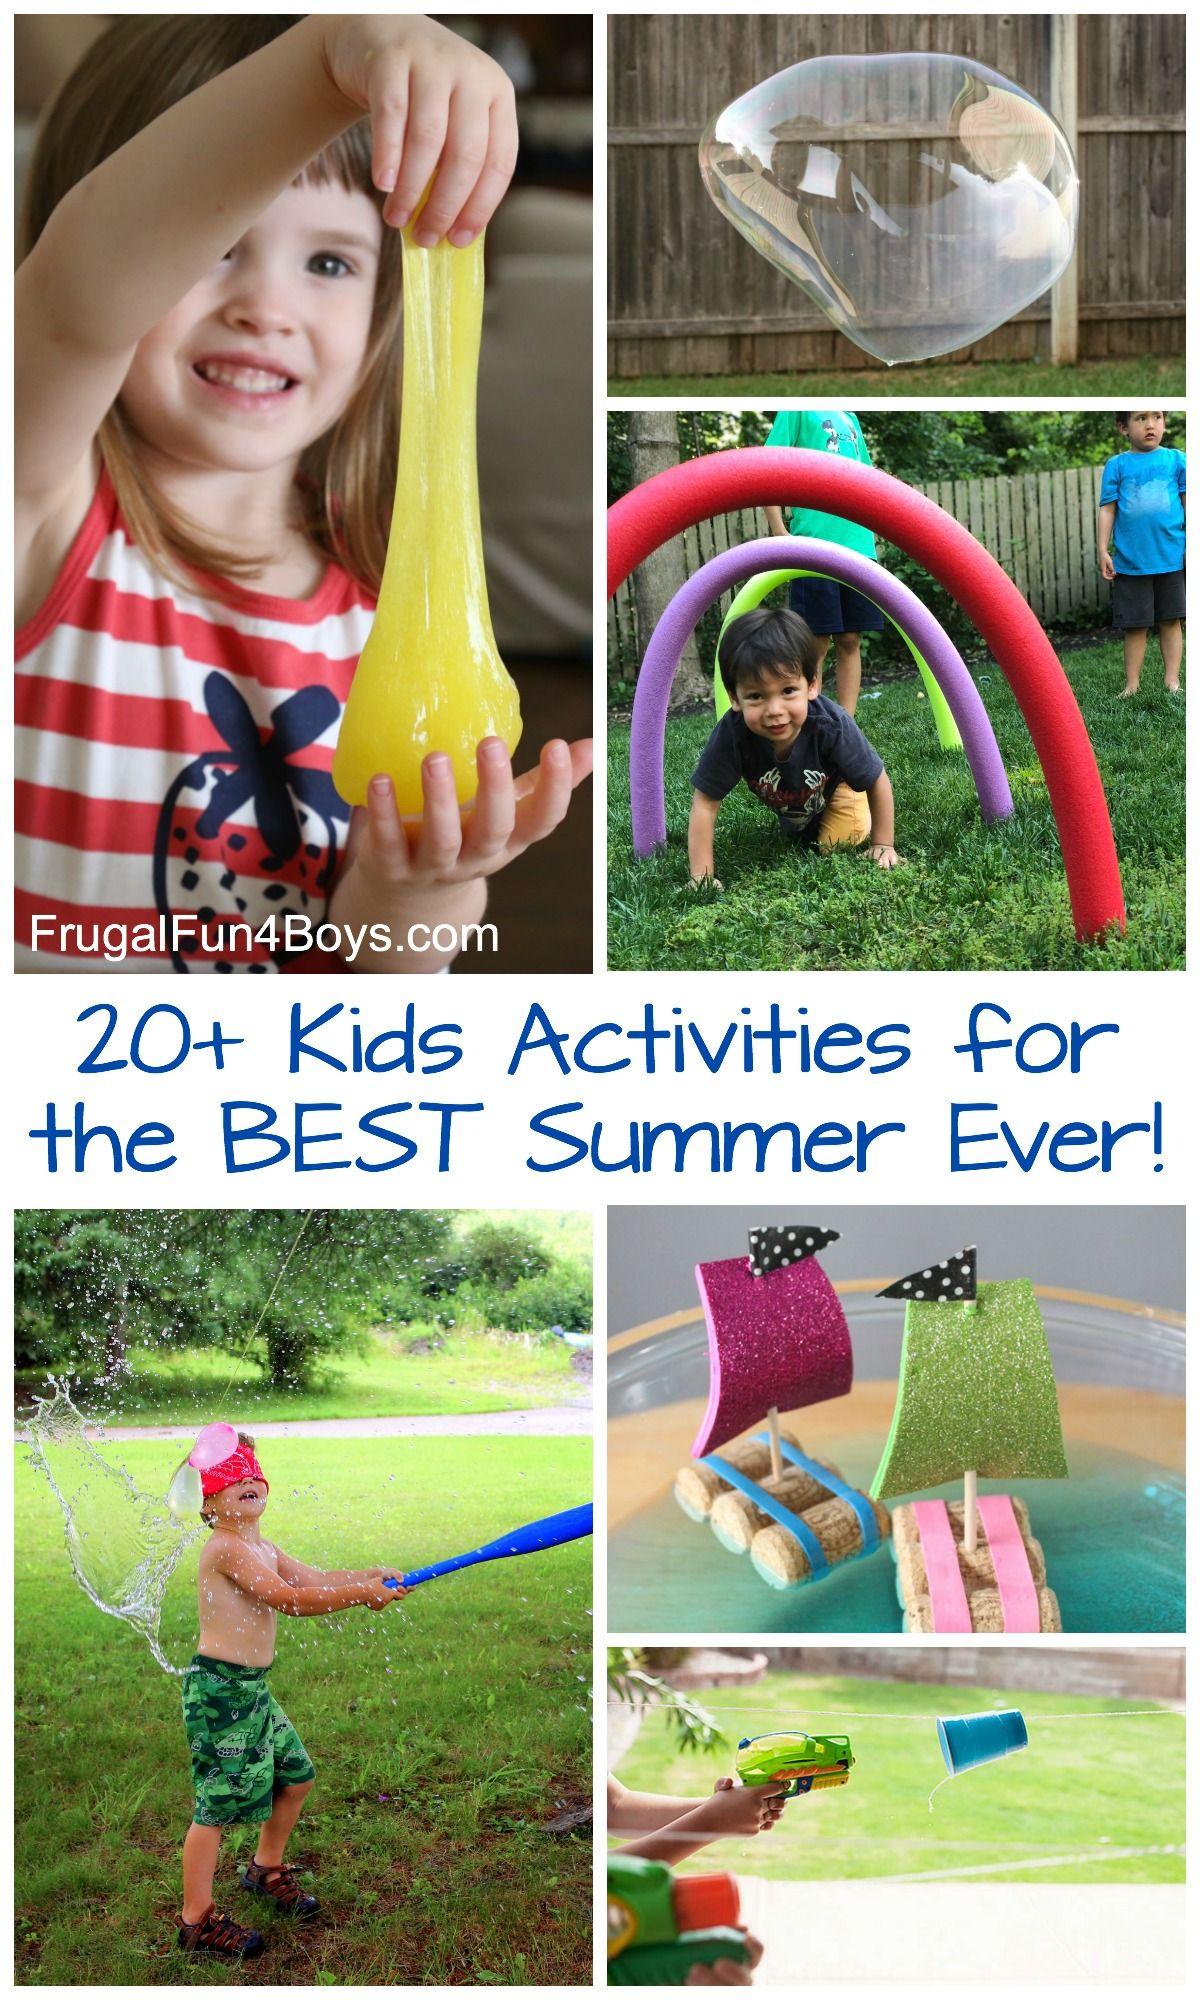 20 Kids Activities For The Best Summer Ever Frugal Fun For Boys And Girls Activities For Kids Summer Activities For Kids Fun Activities For Kids